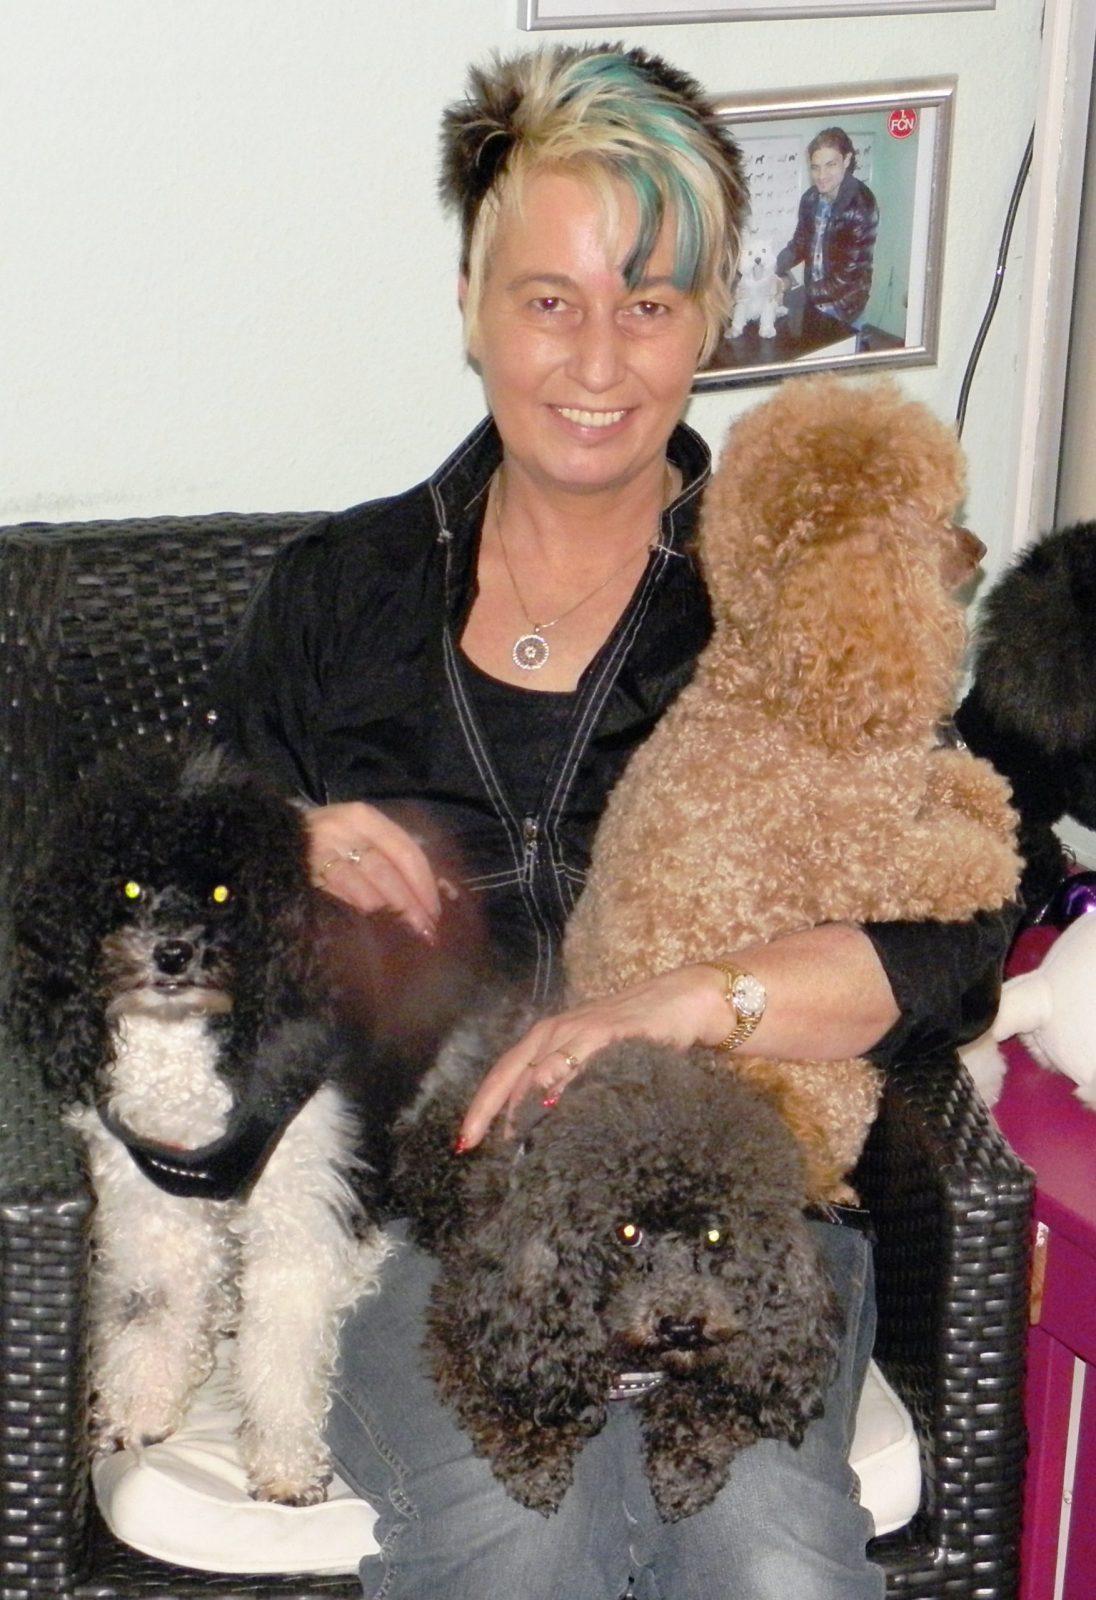 Pico Bello Chefin Hundesalon